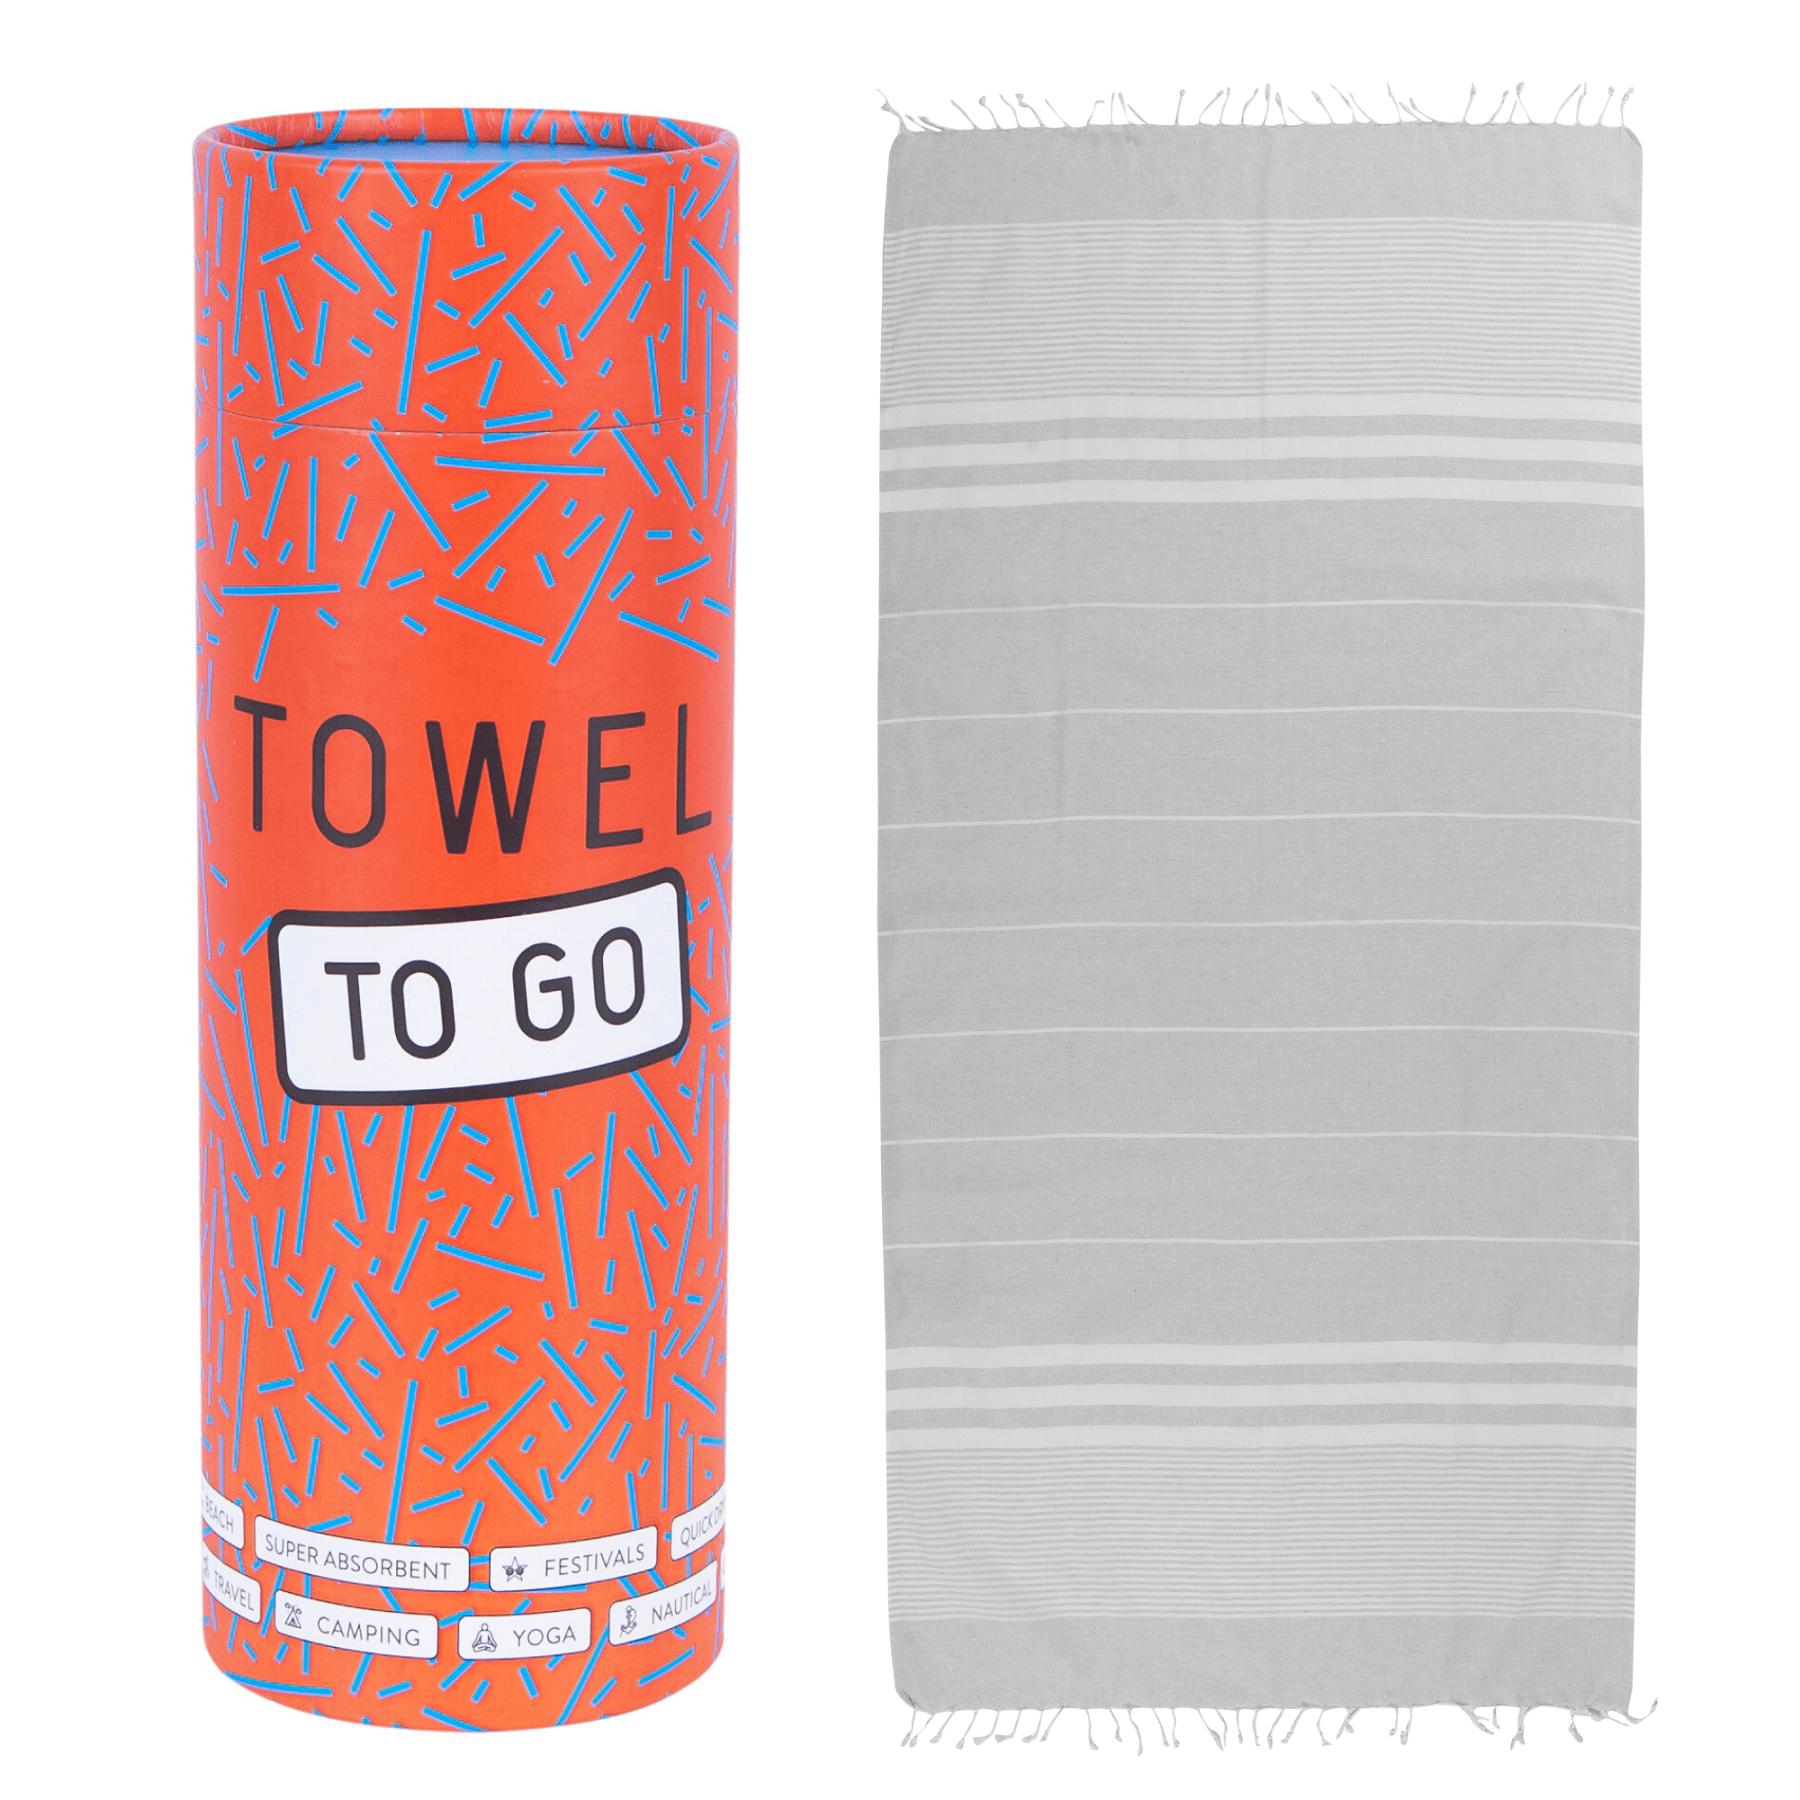 Towel to Go - Hammam towel in Grey